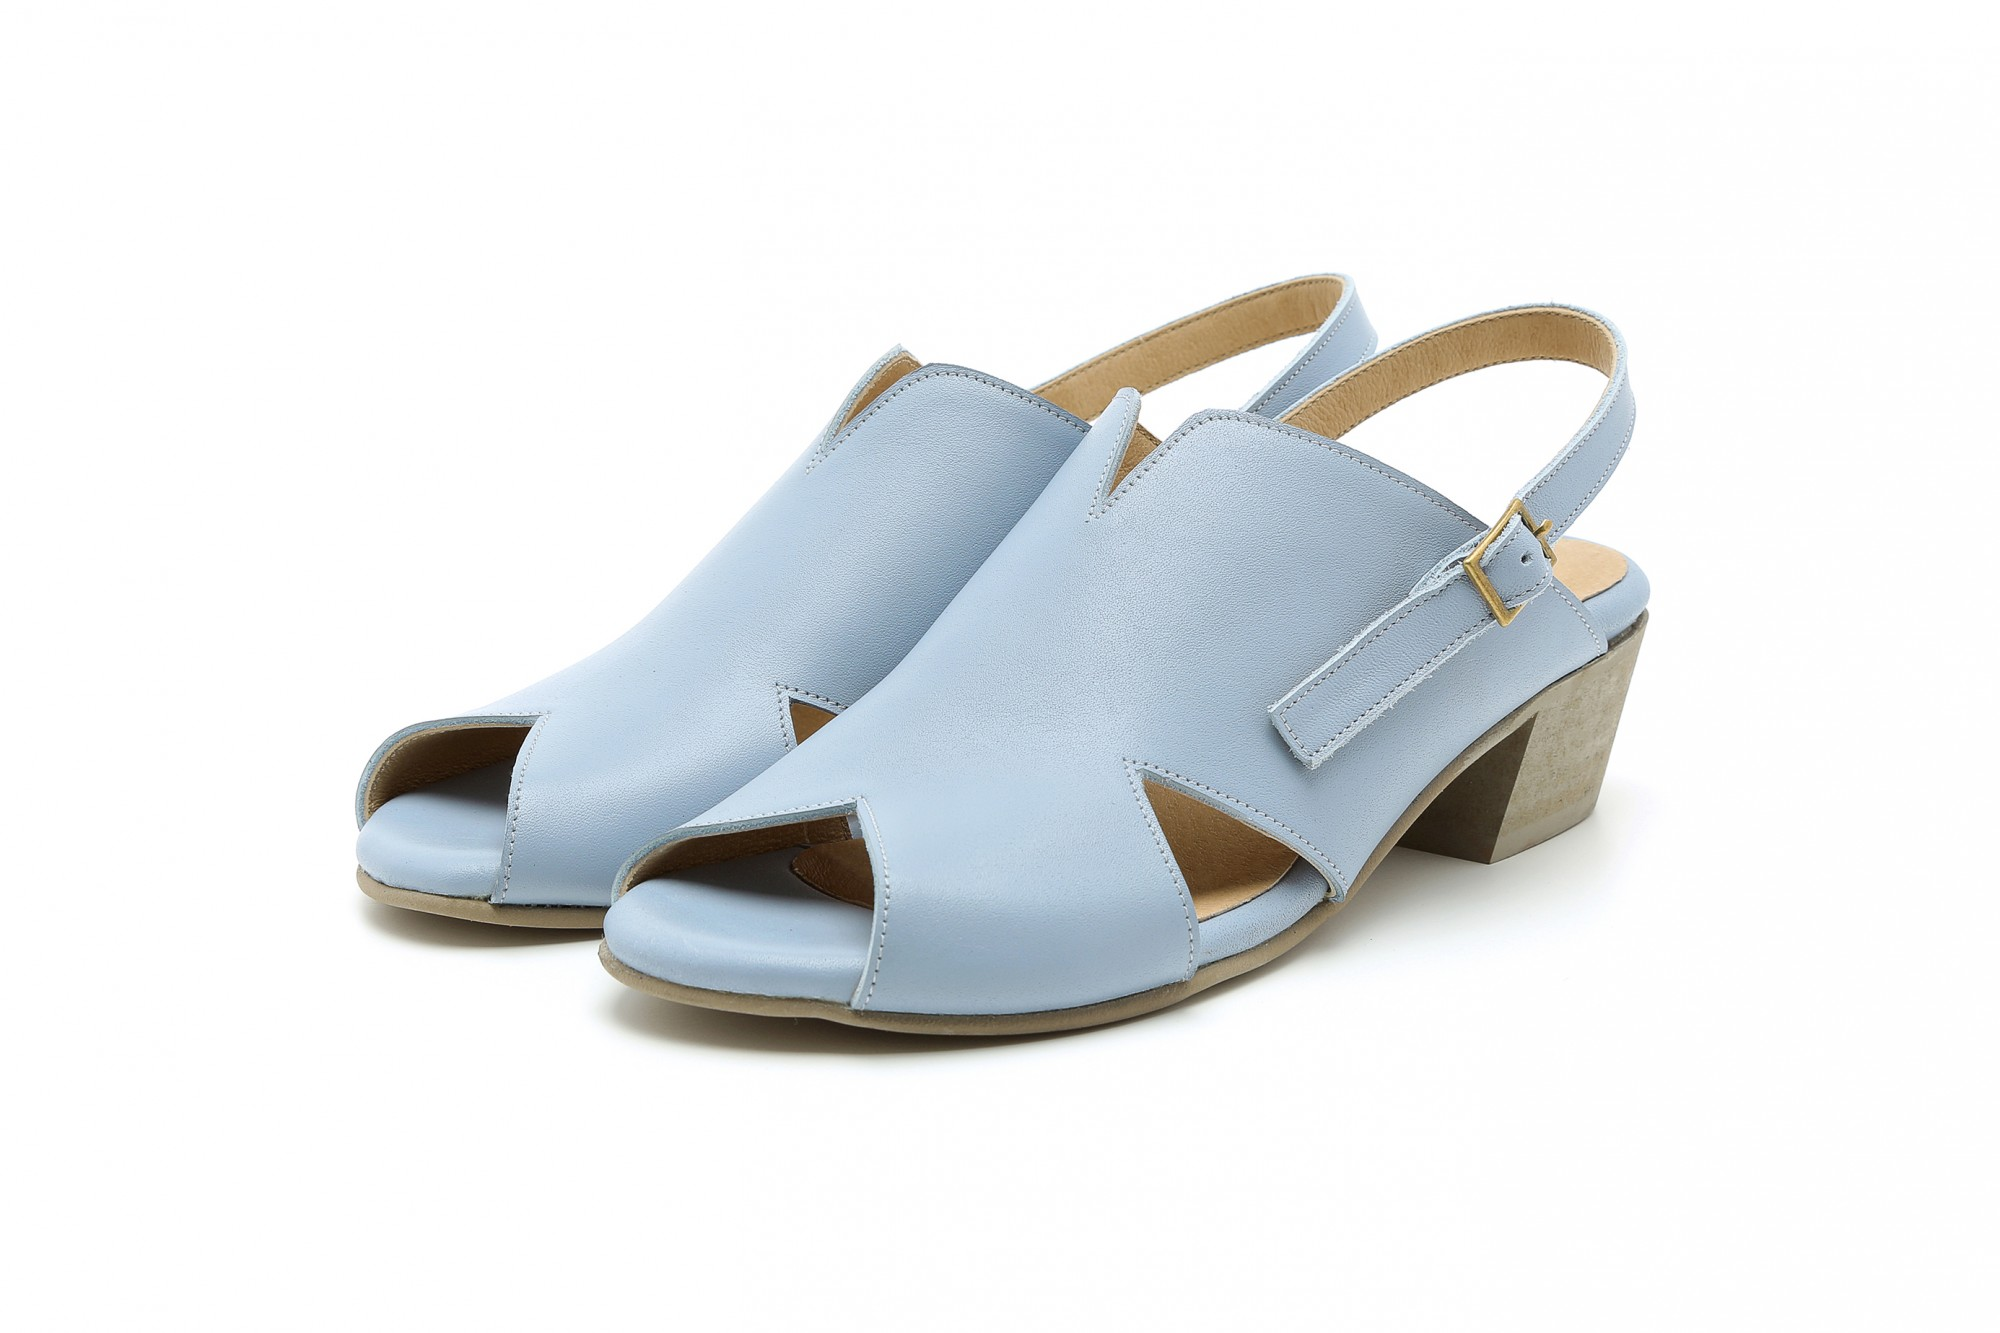 ADI KILAV - Handmade leather Shoes